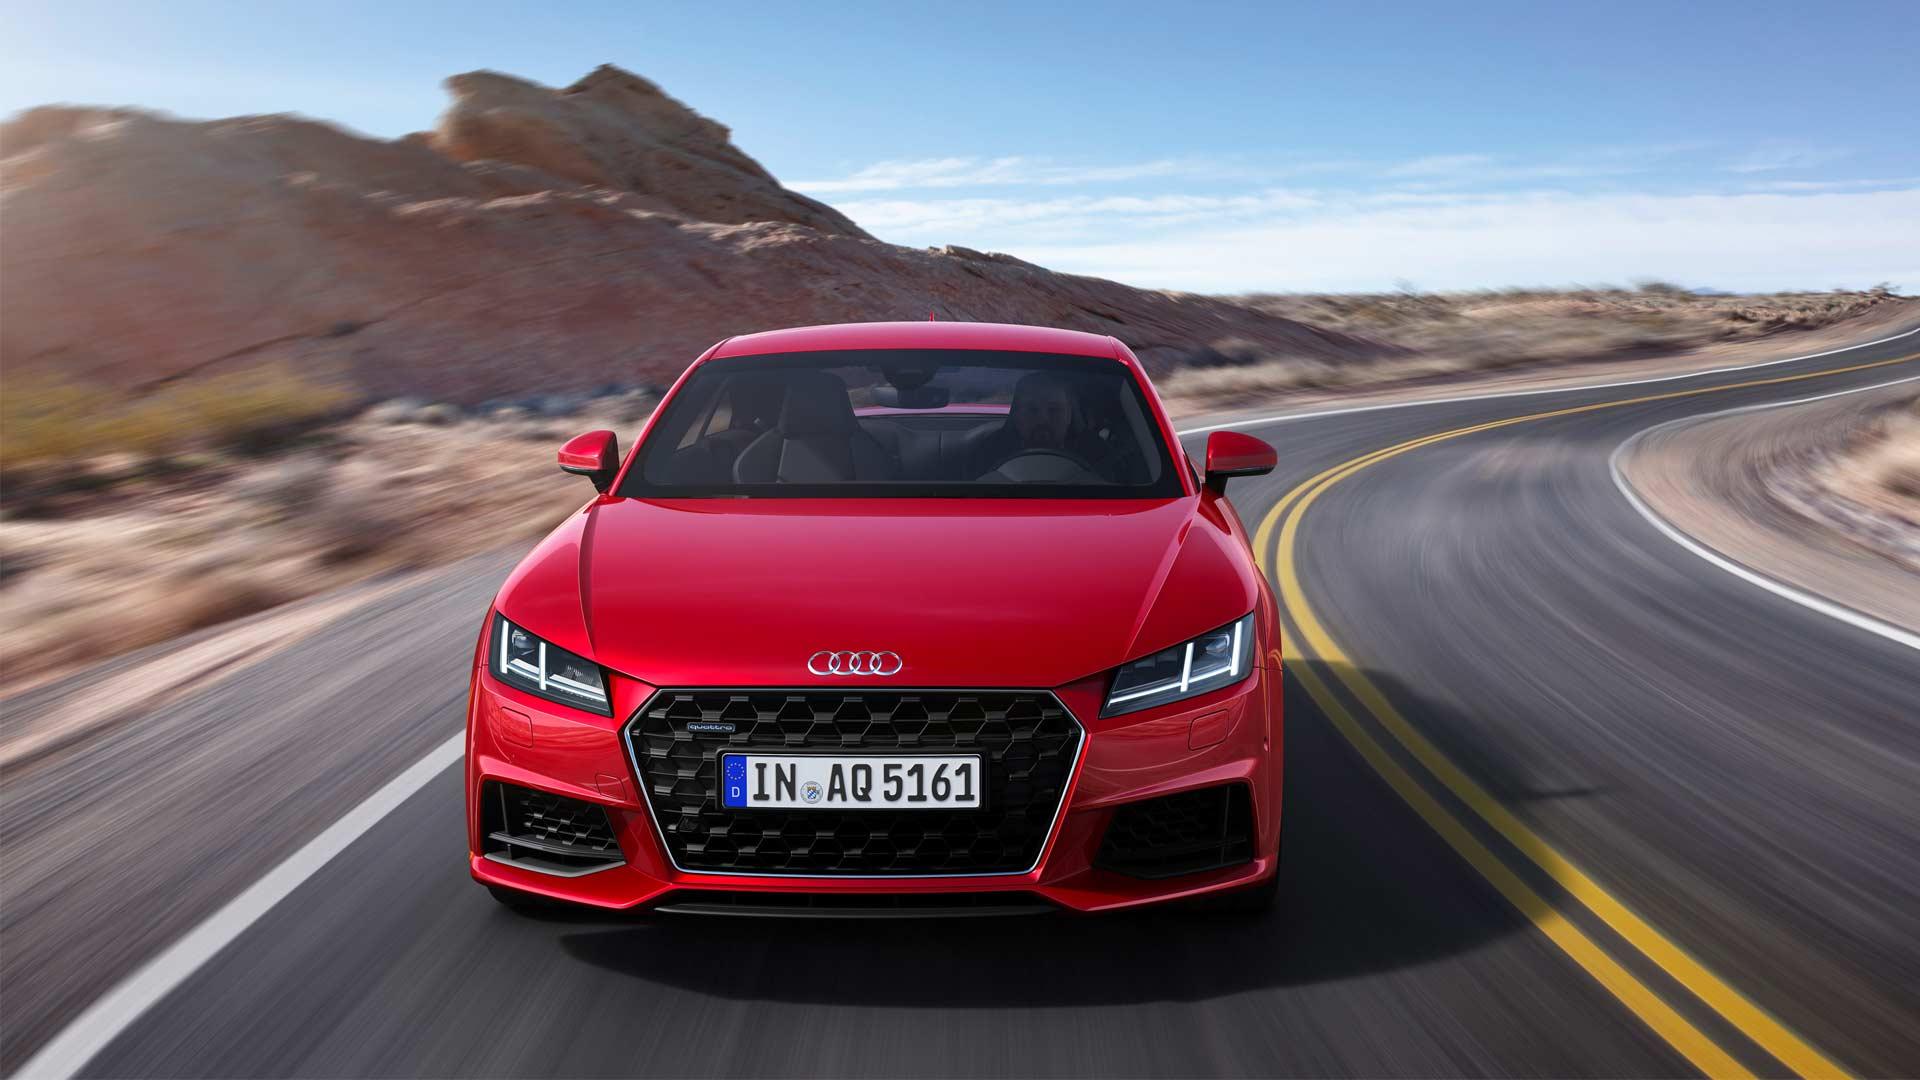 2019-Audi-TT-Coupe